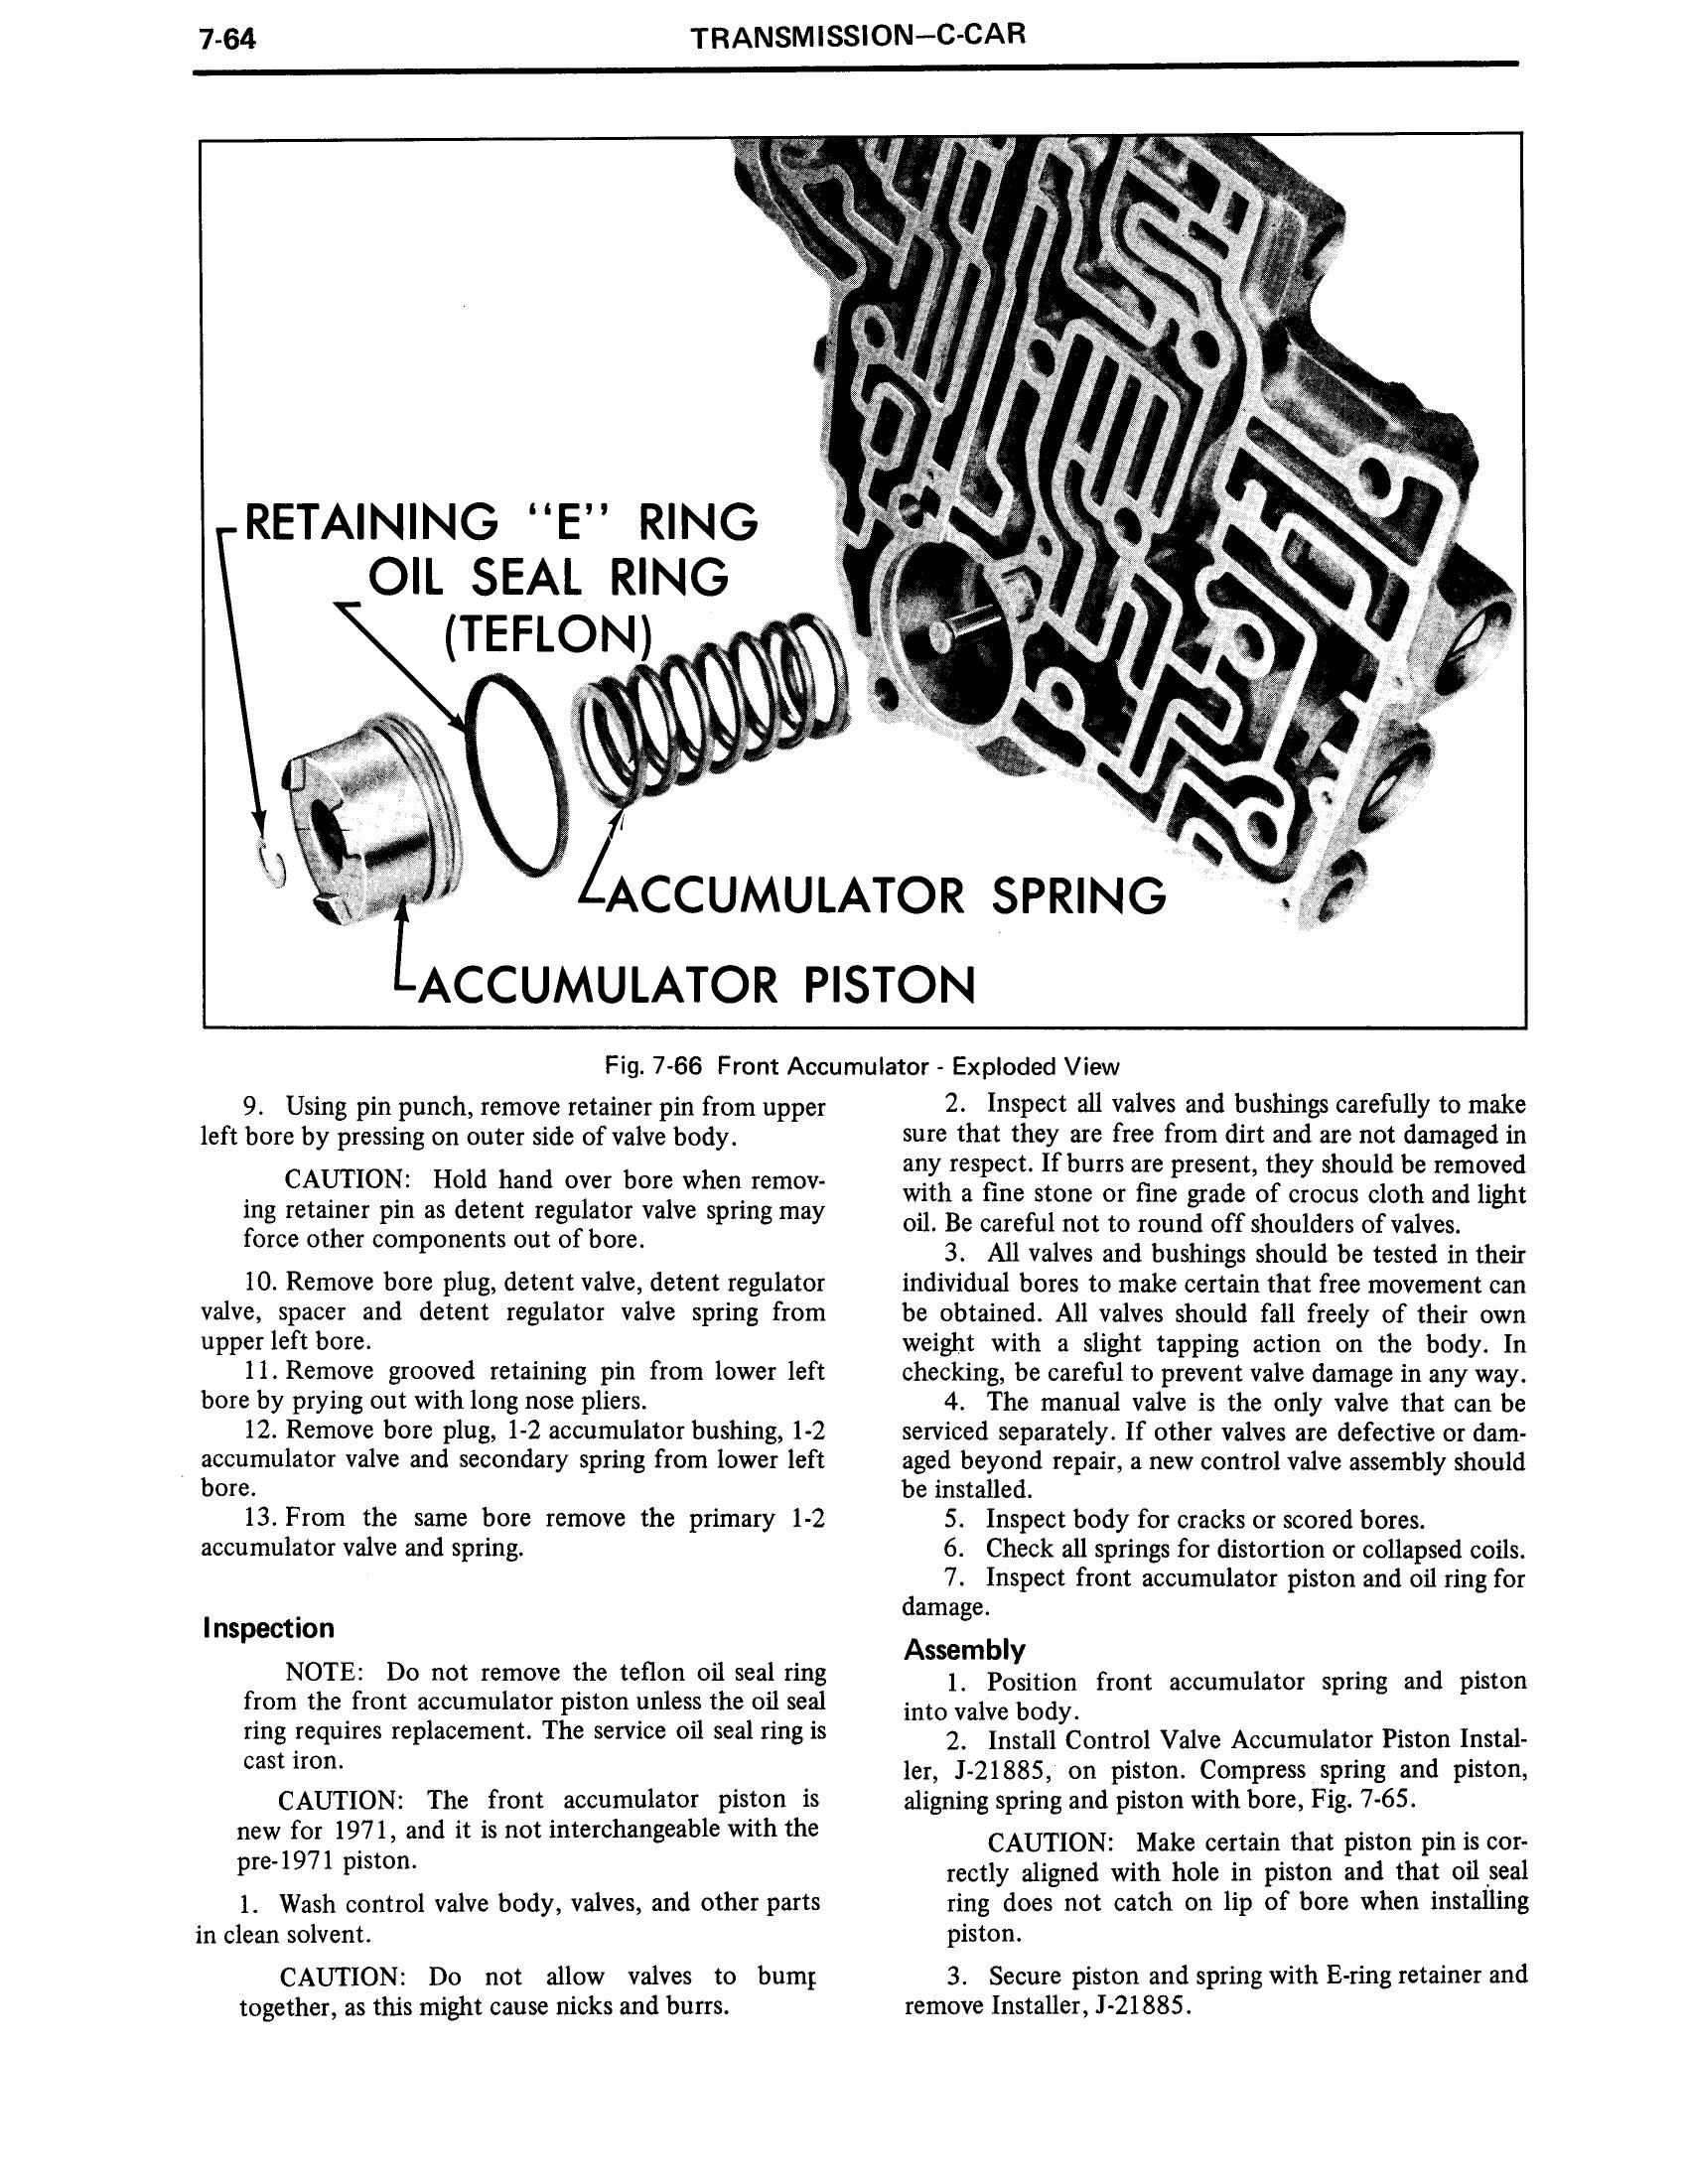 1971 Cadillac Shop Manual- Transmission Page 64 of 156